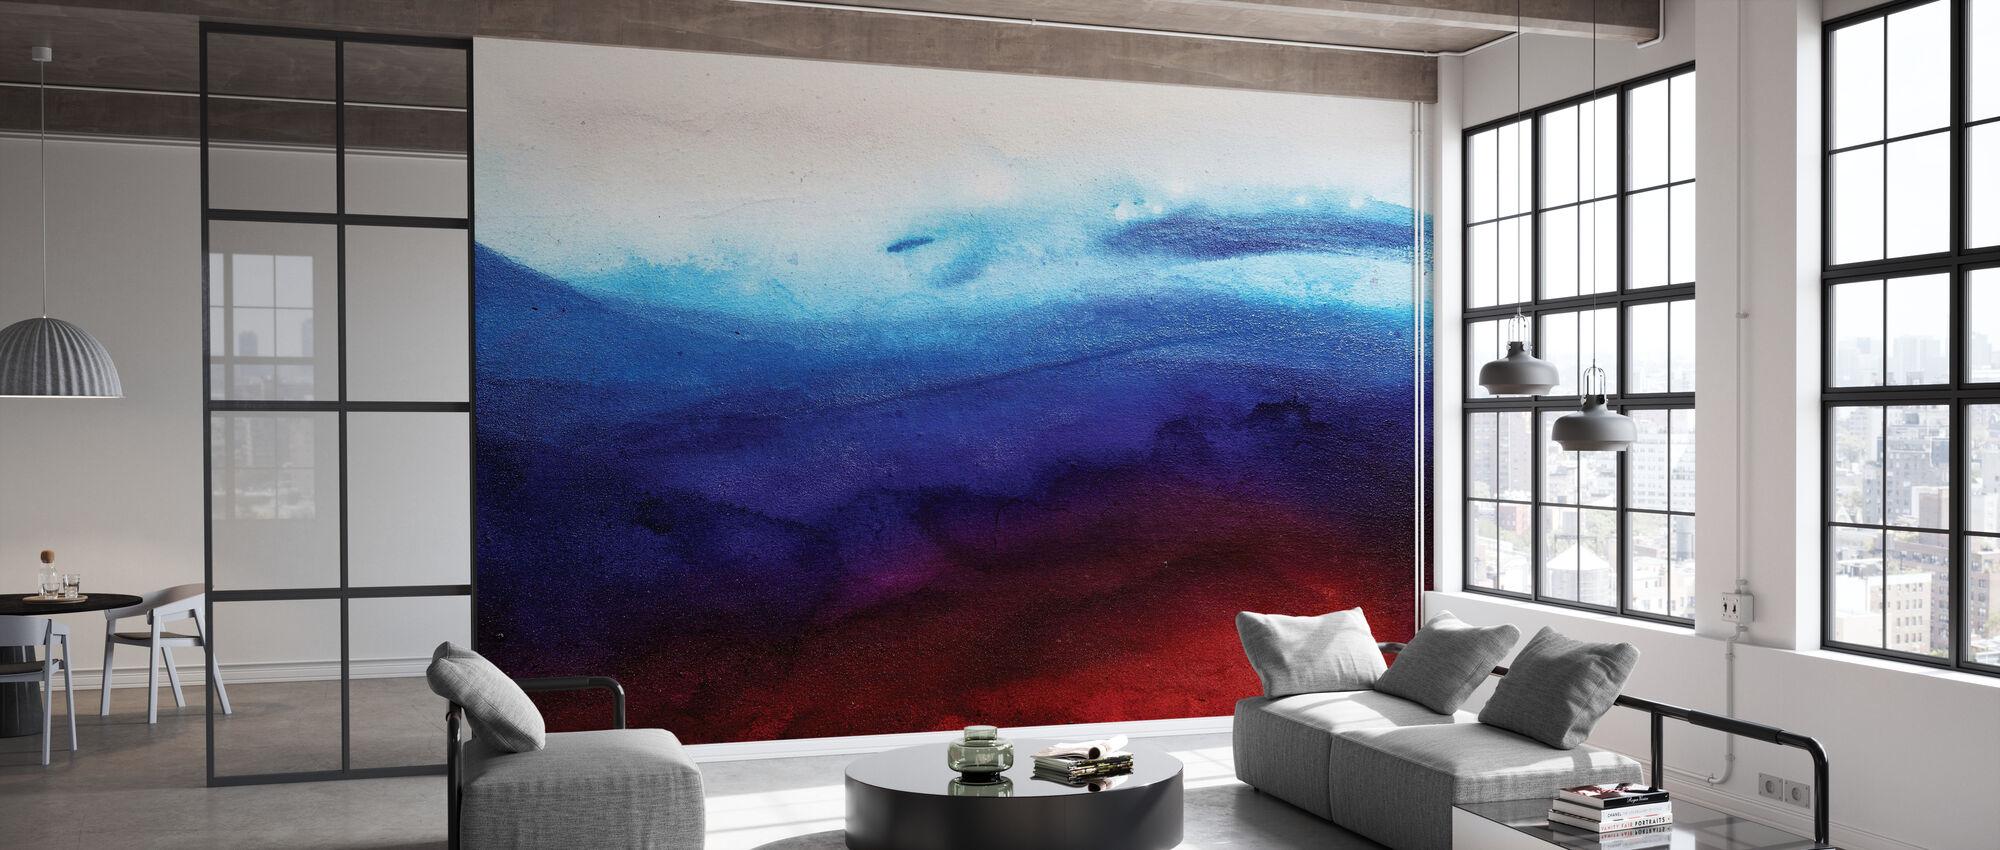 Ruby Tides - Wallpaper - Office